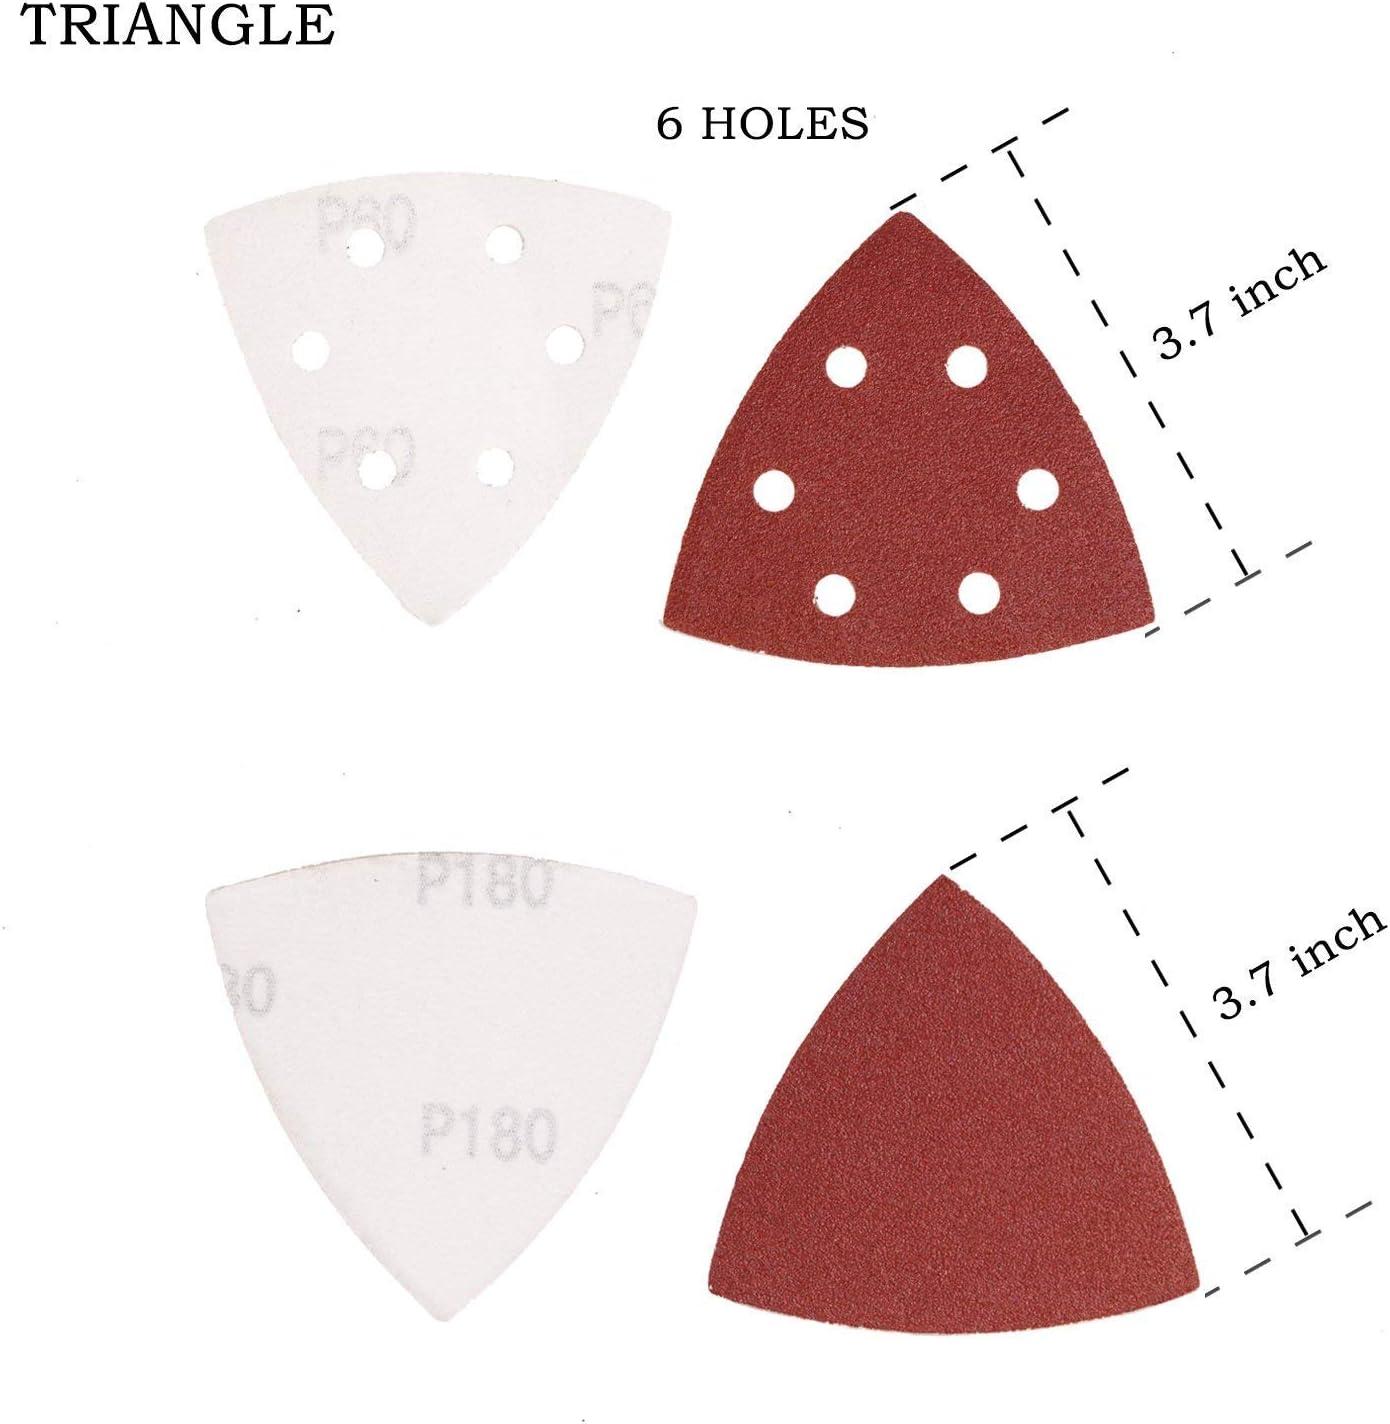 100 x Triangle Velcro Triangular Sander Sanding Triangle Delta Sander 6-Hole Grit Mixed 20 Sheets P40-P180